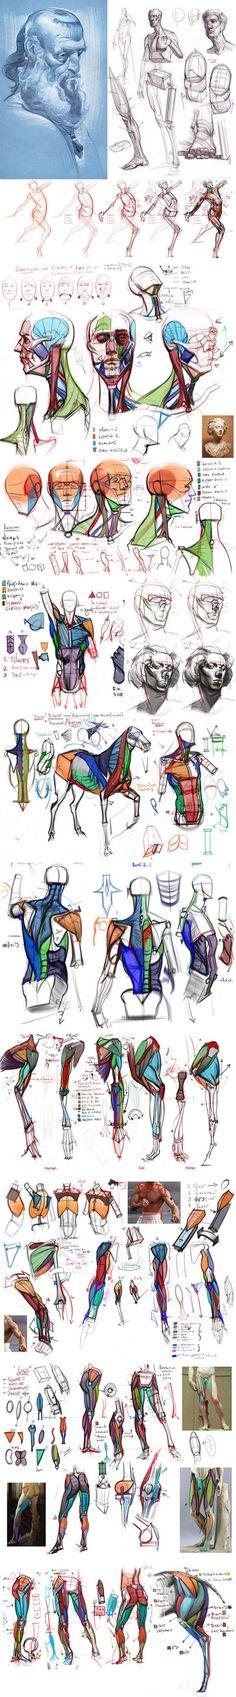 Anatomy Sketches, Anatomy Drawing, Anatomy Art, Human Anatomy, Body Anatomy, Figure Drawing Reference, Anatomy Reference, Drawing Skills, Drawing Techniques